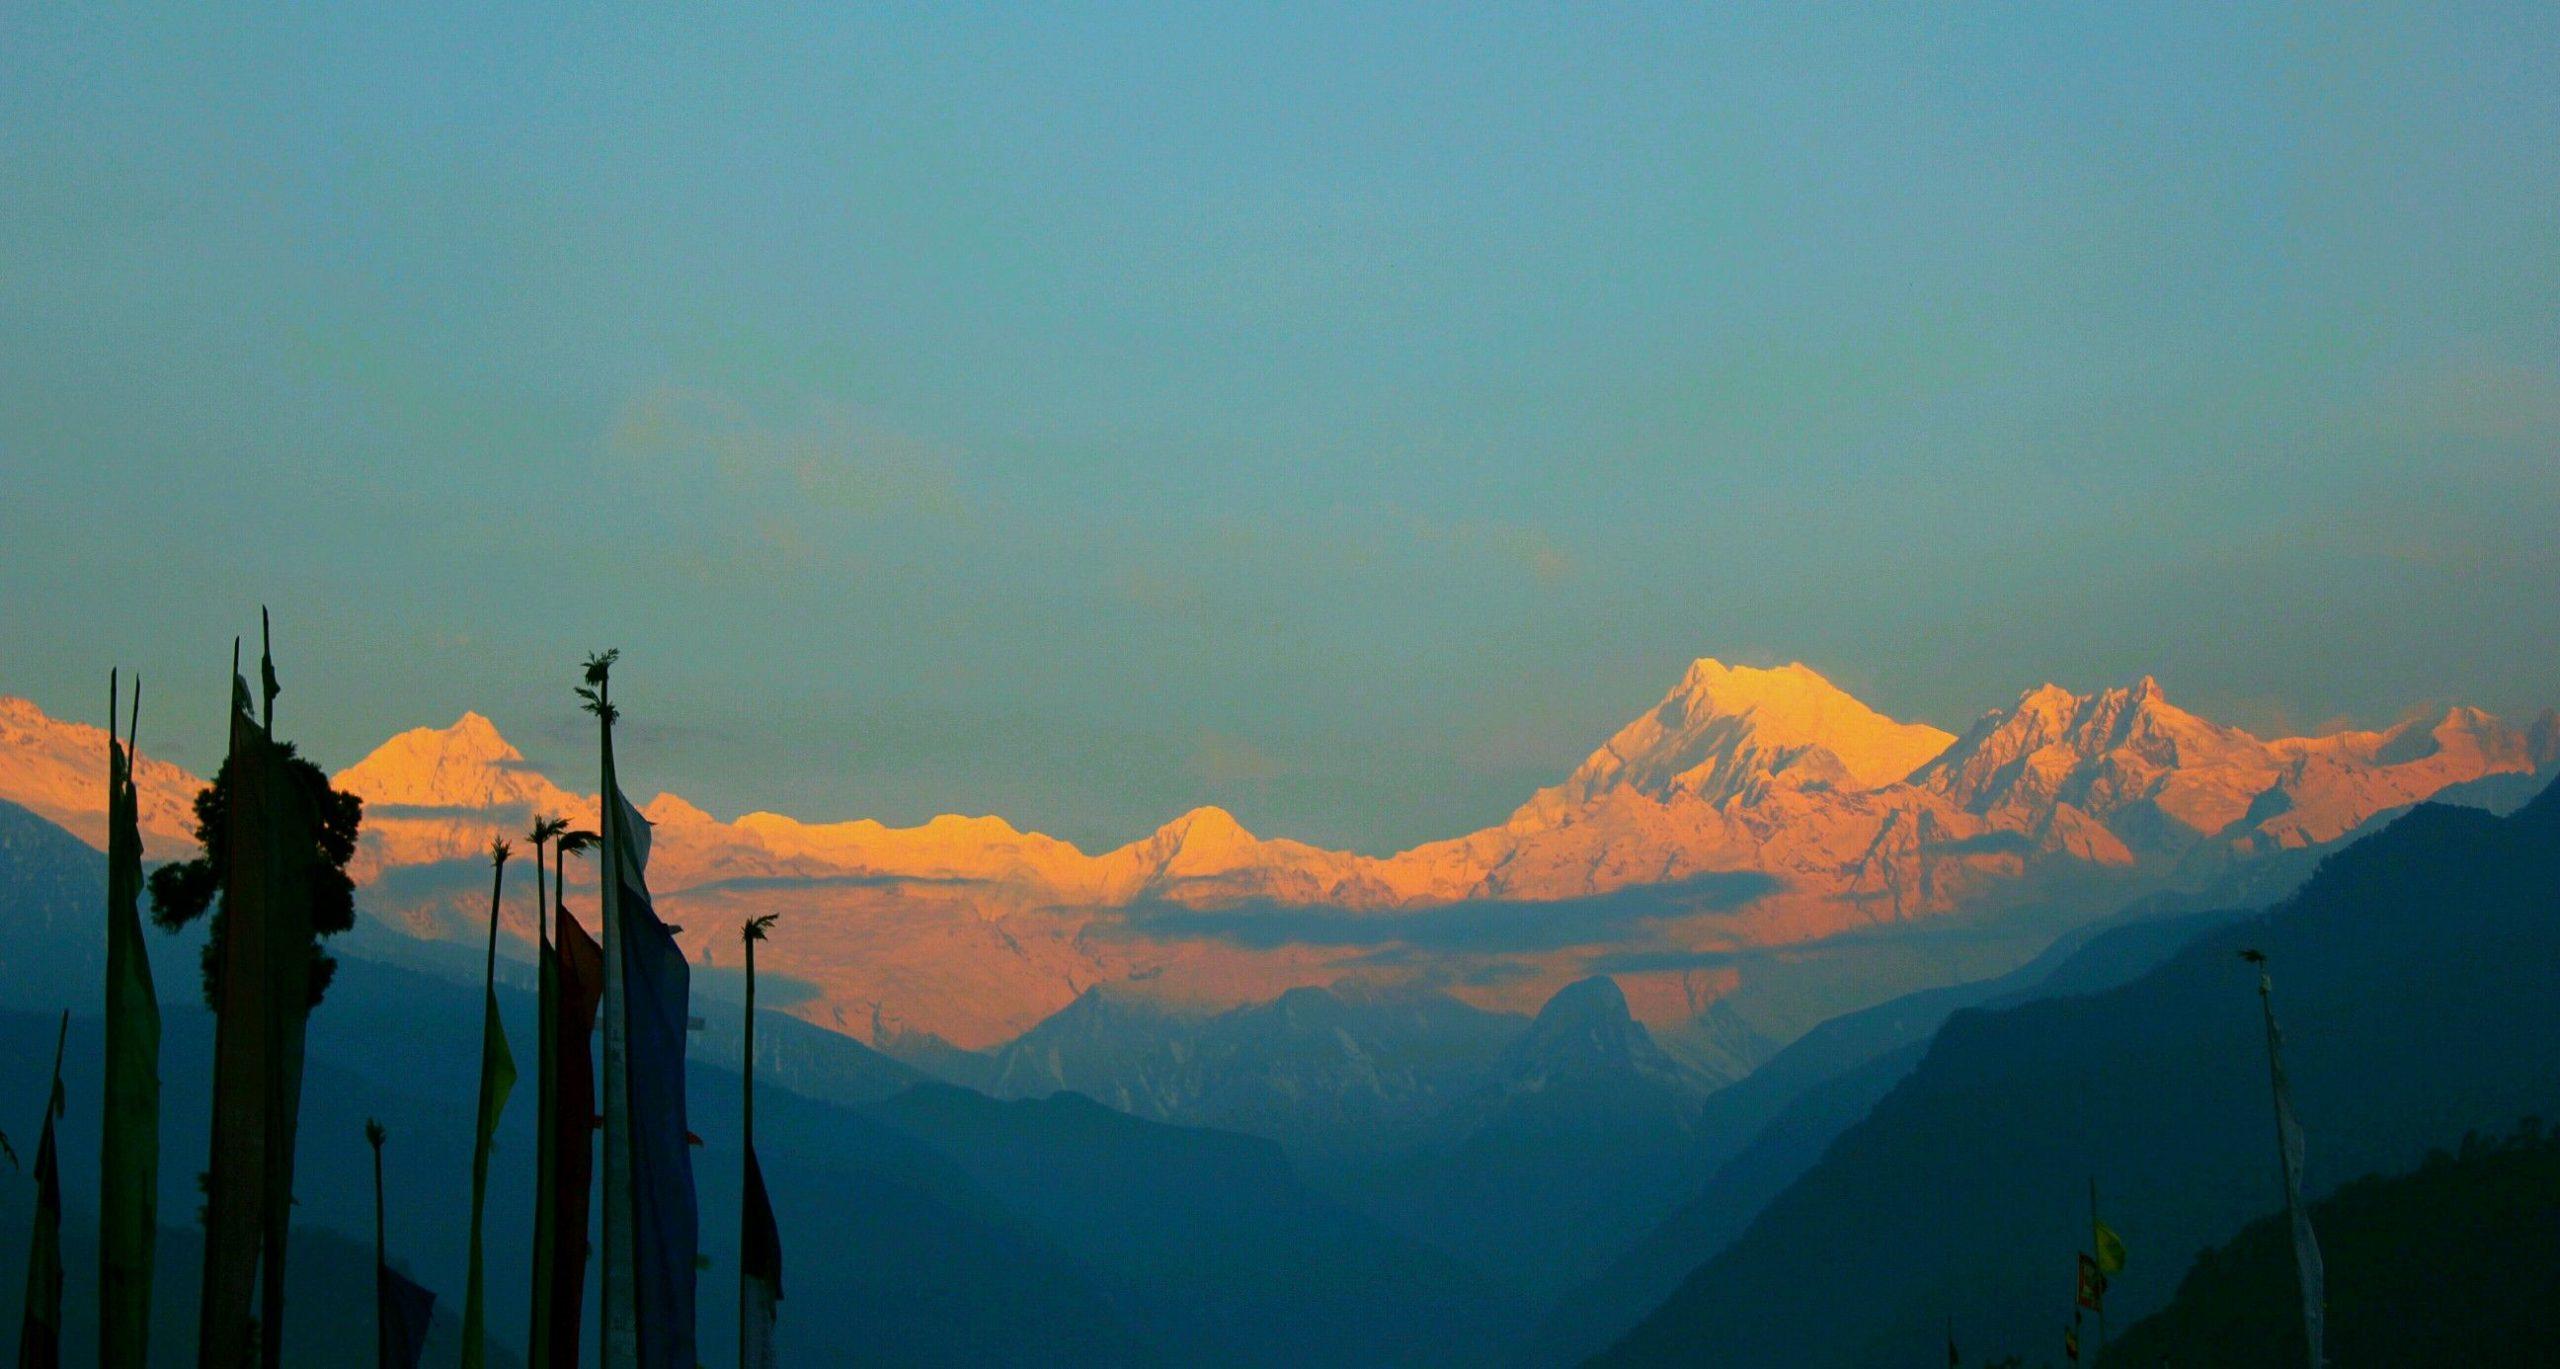 Singhik, Sikkim